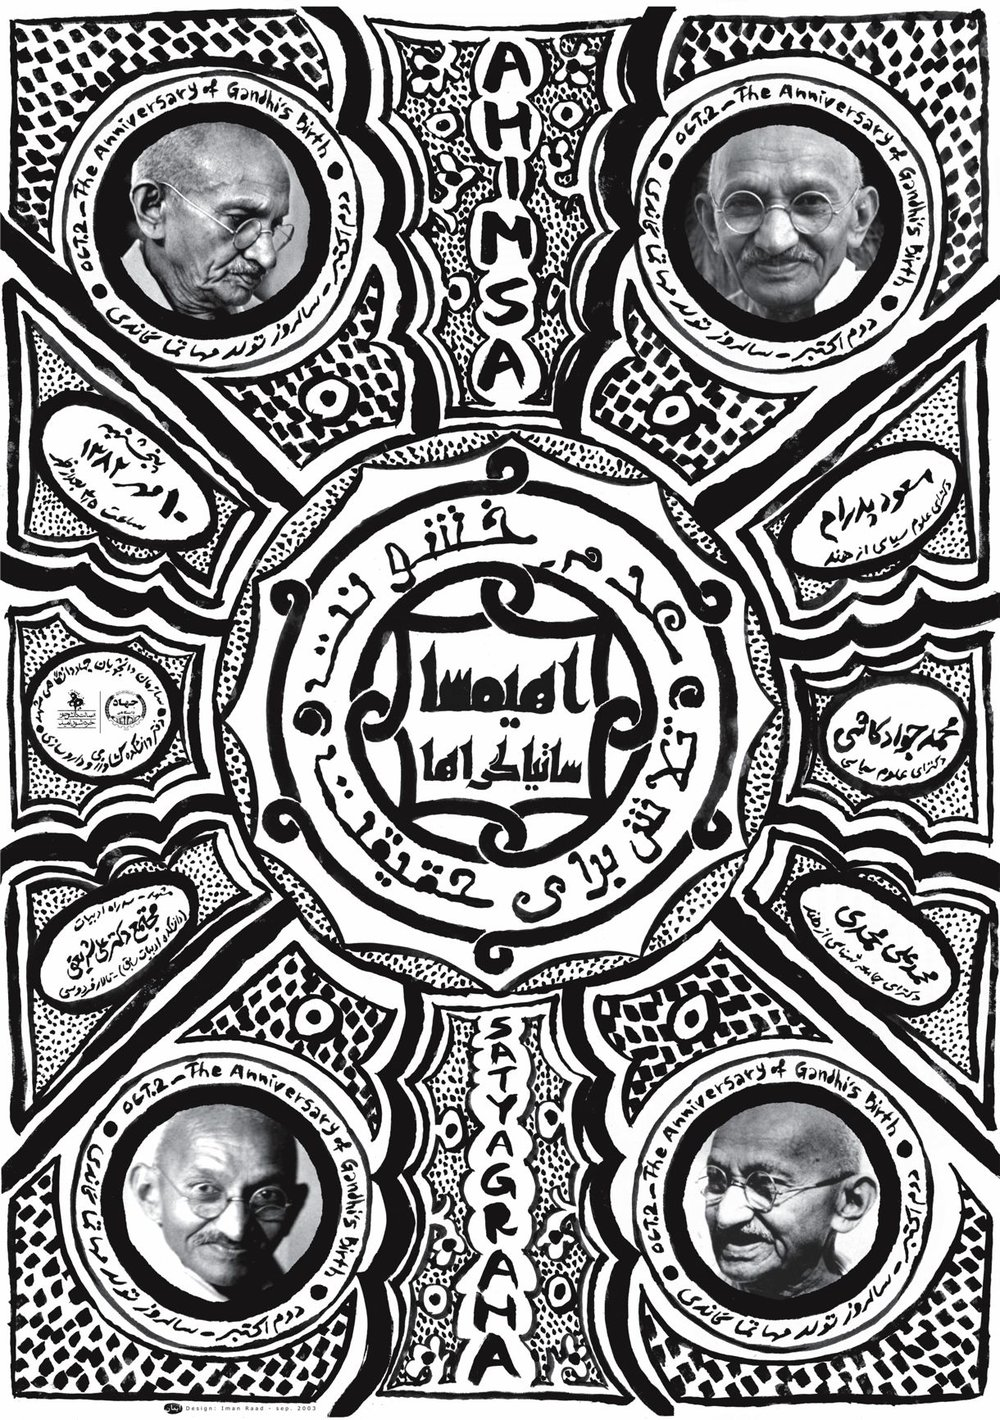 iman-raad-2003-05-02.jpg